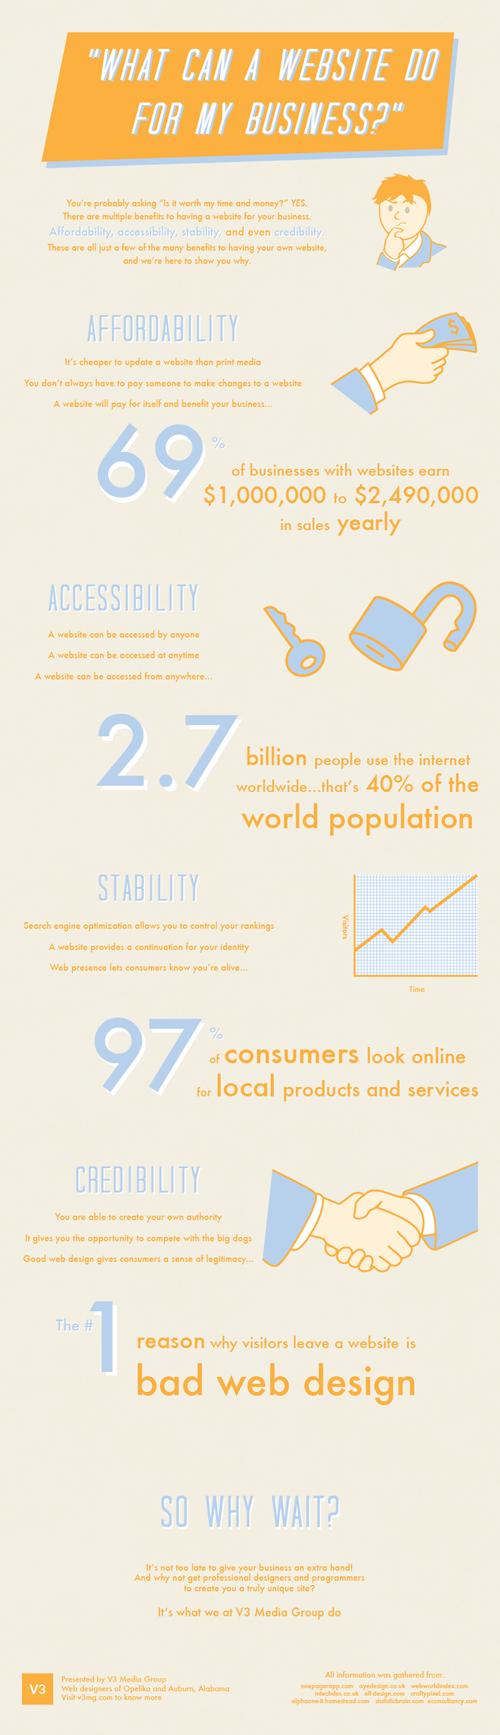 Website Benefits infographic for V3 Media Group